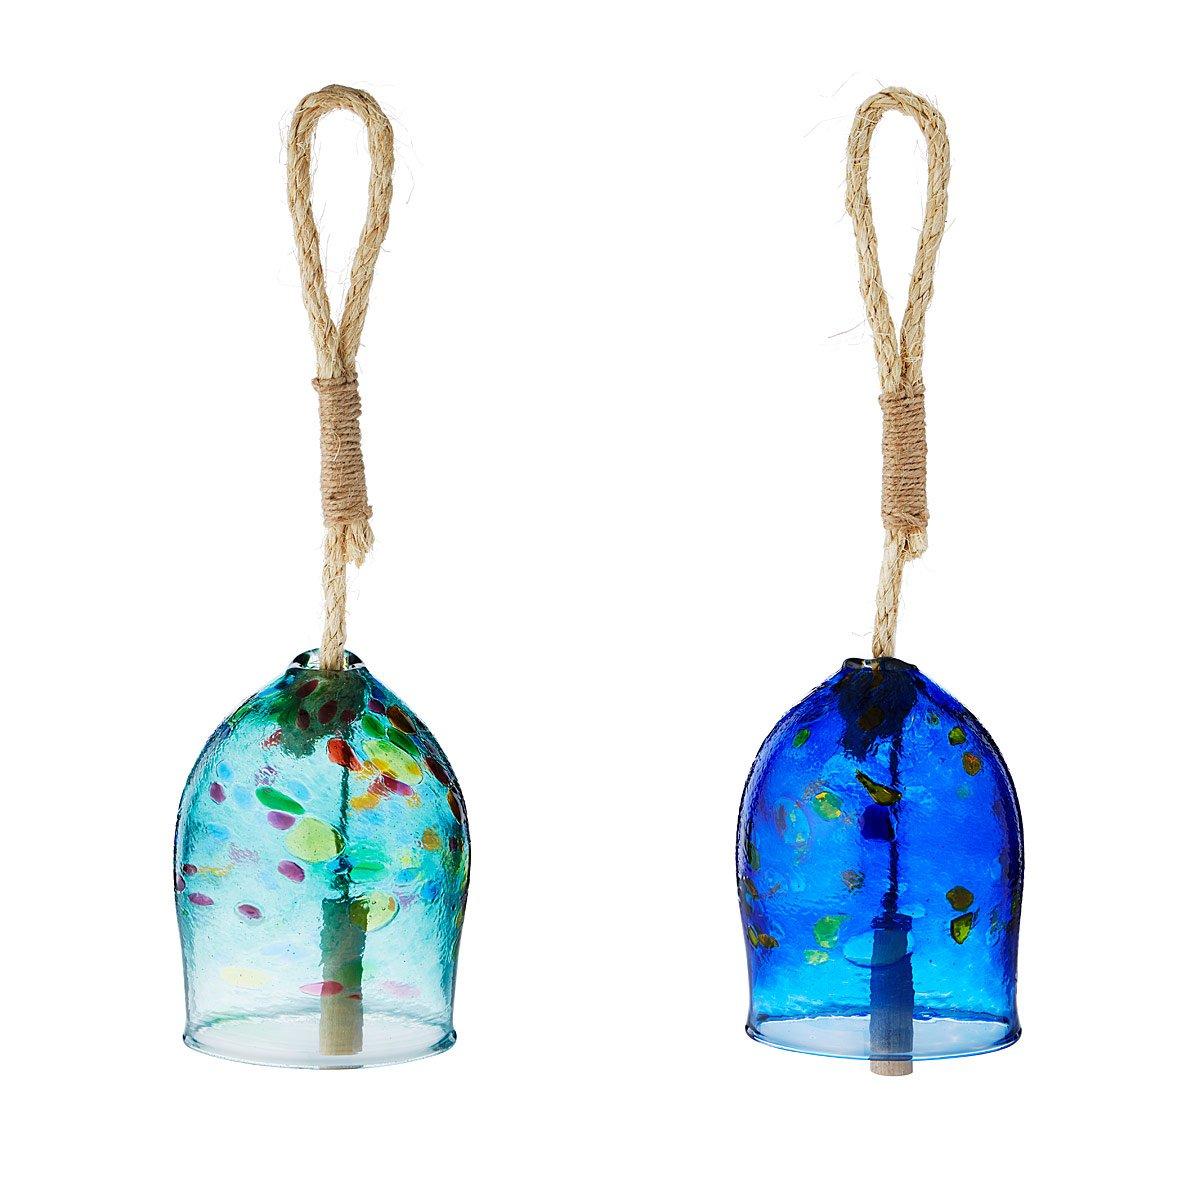 Glass Garden Bells wind chime UncommonGoods